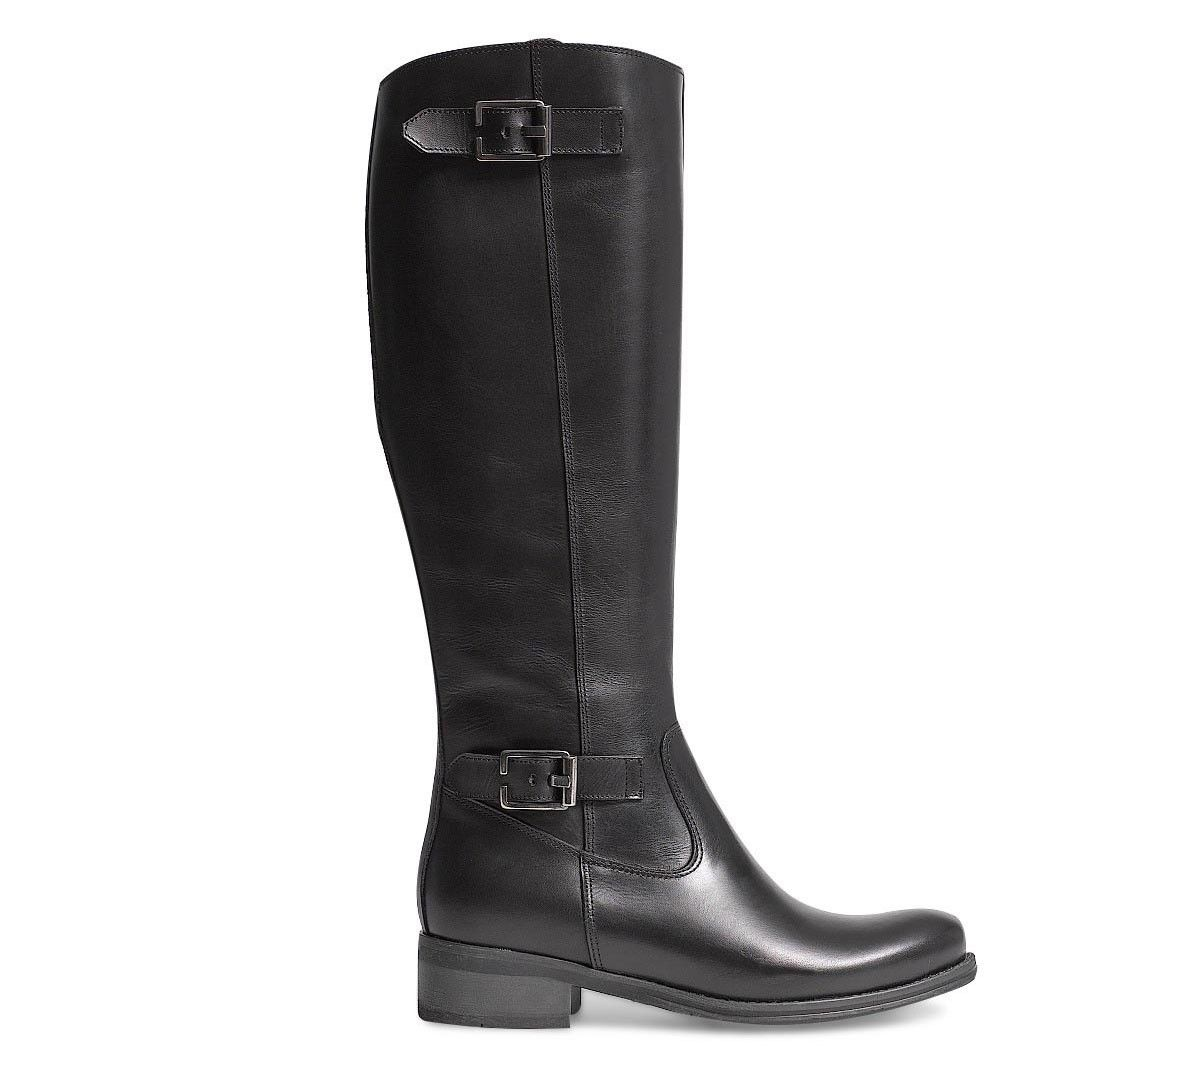 8fe14d9f132695 I love Eram | Chaussures | Pinterest | Bottes, Cuir noir et Chaussure